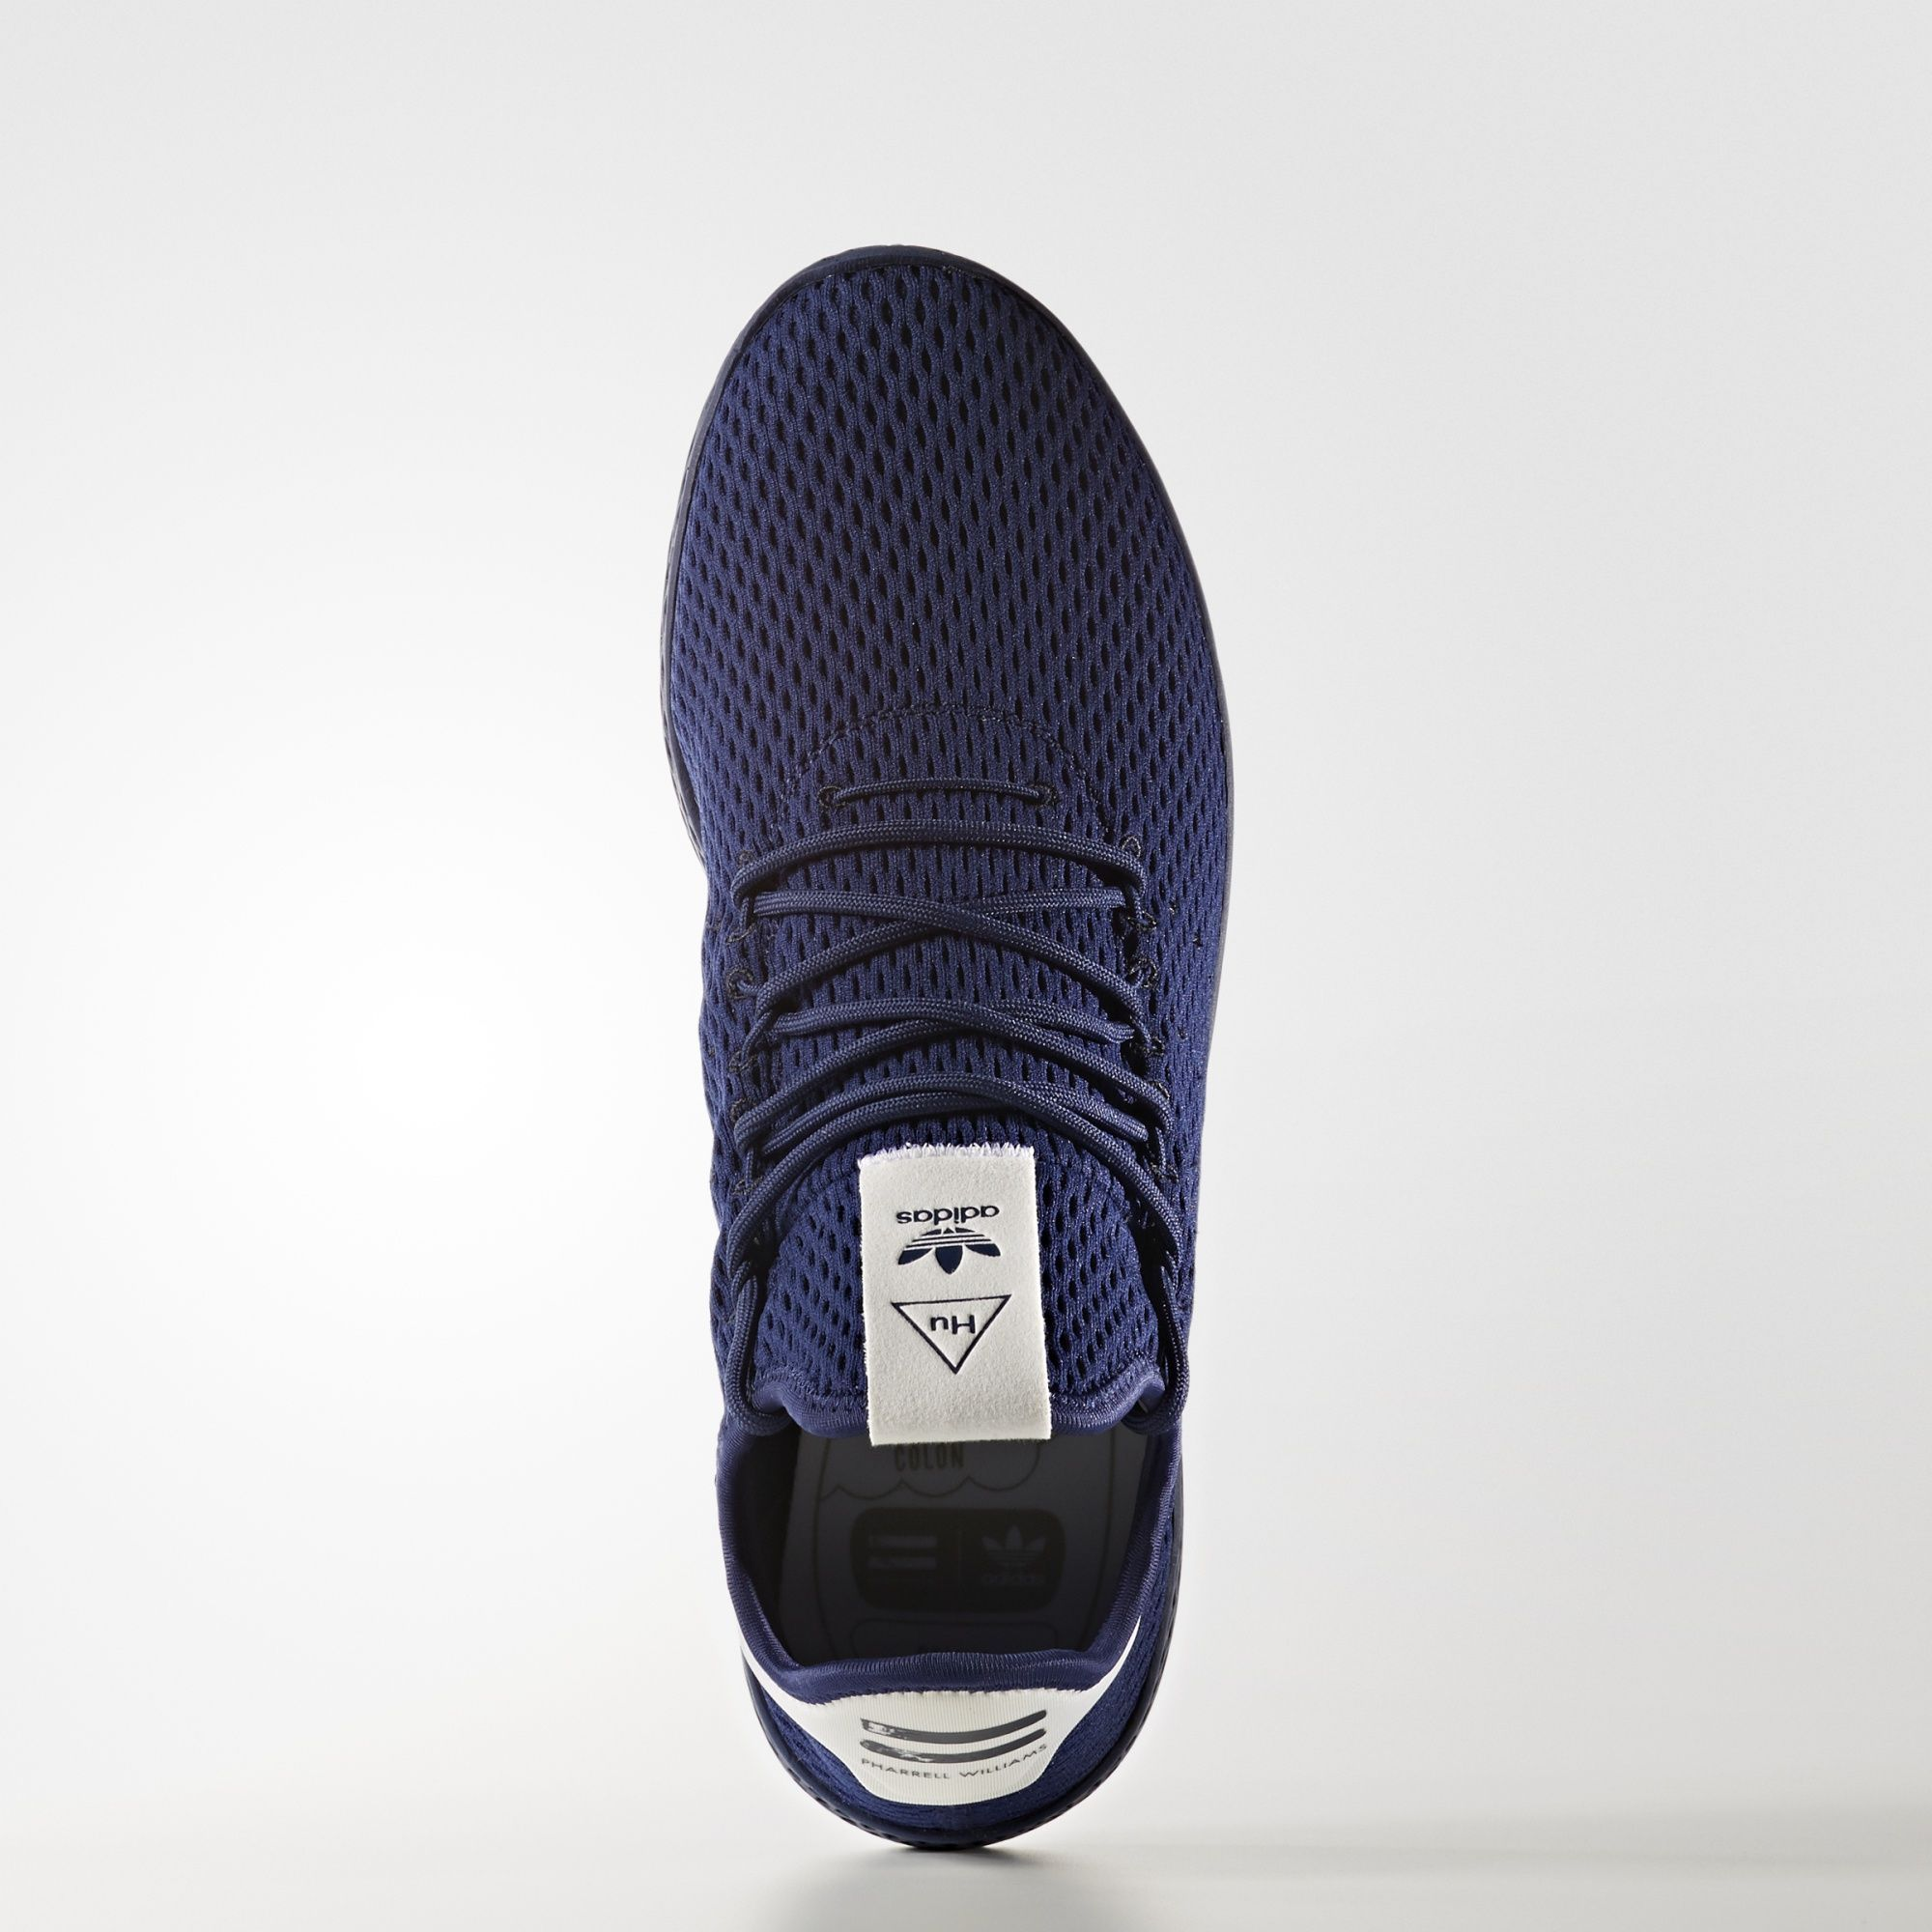 22a2b64b12fa Pharrell Williams x adidas Tennis HU – Dark Blue